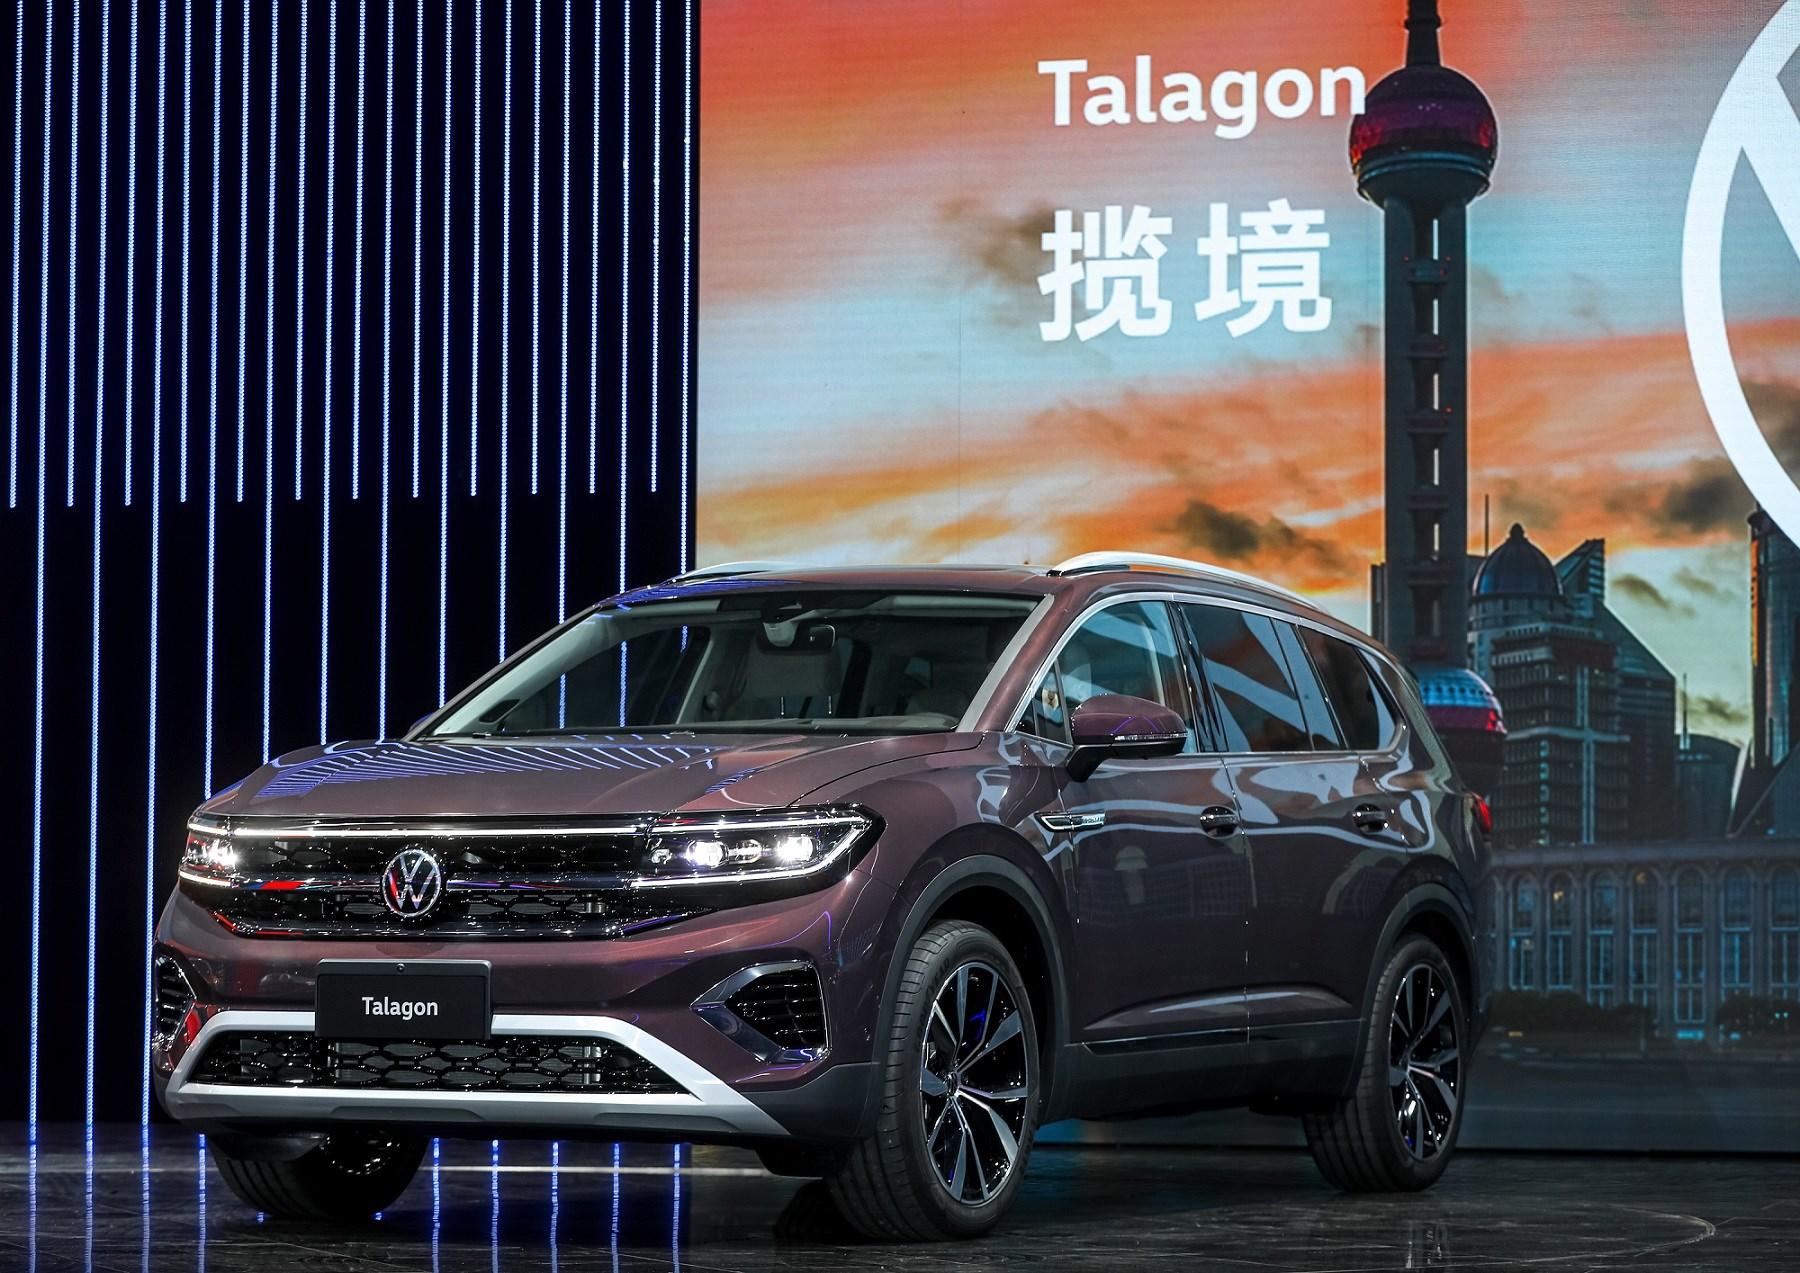 Volkswagen Talagon foi apresentado no Salão de Xangai